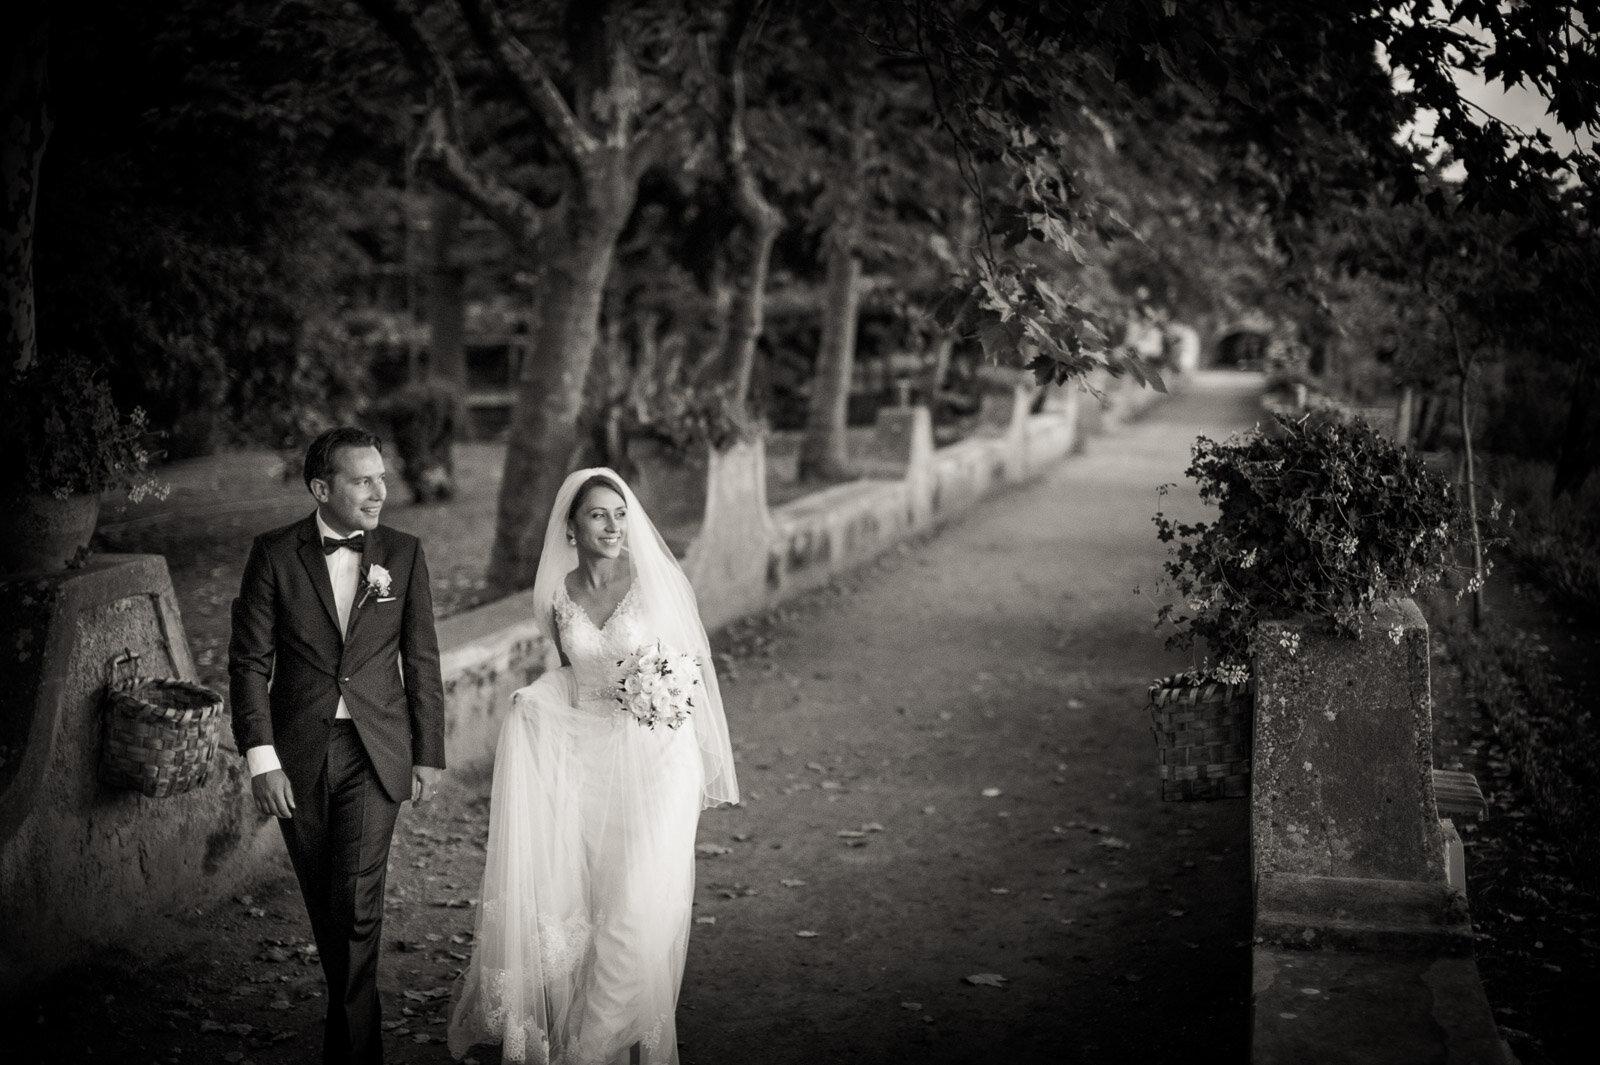 Russian Wedding in Villa Cimbrone Costiera Amalfitana 25.jpg